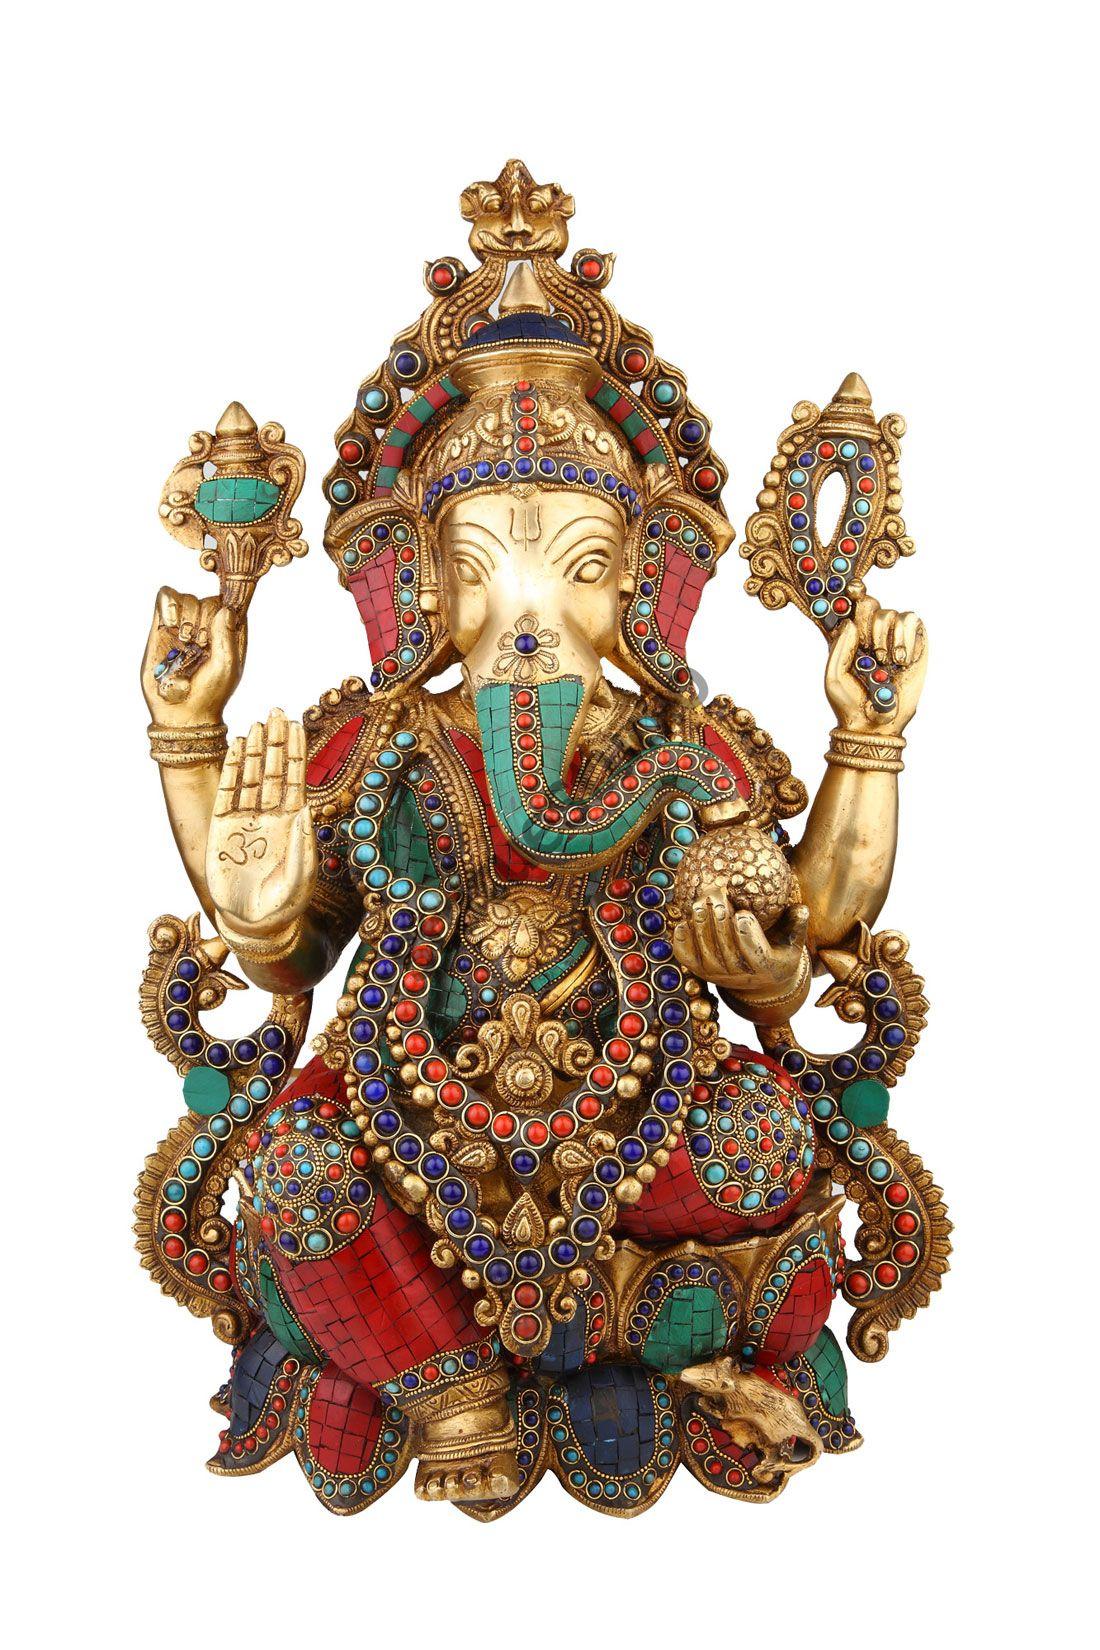 StatueStudio Lord Ganesha Idol Large Size Ganpati